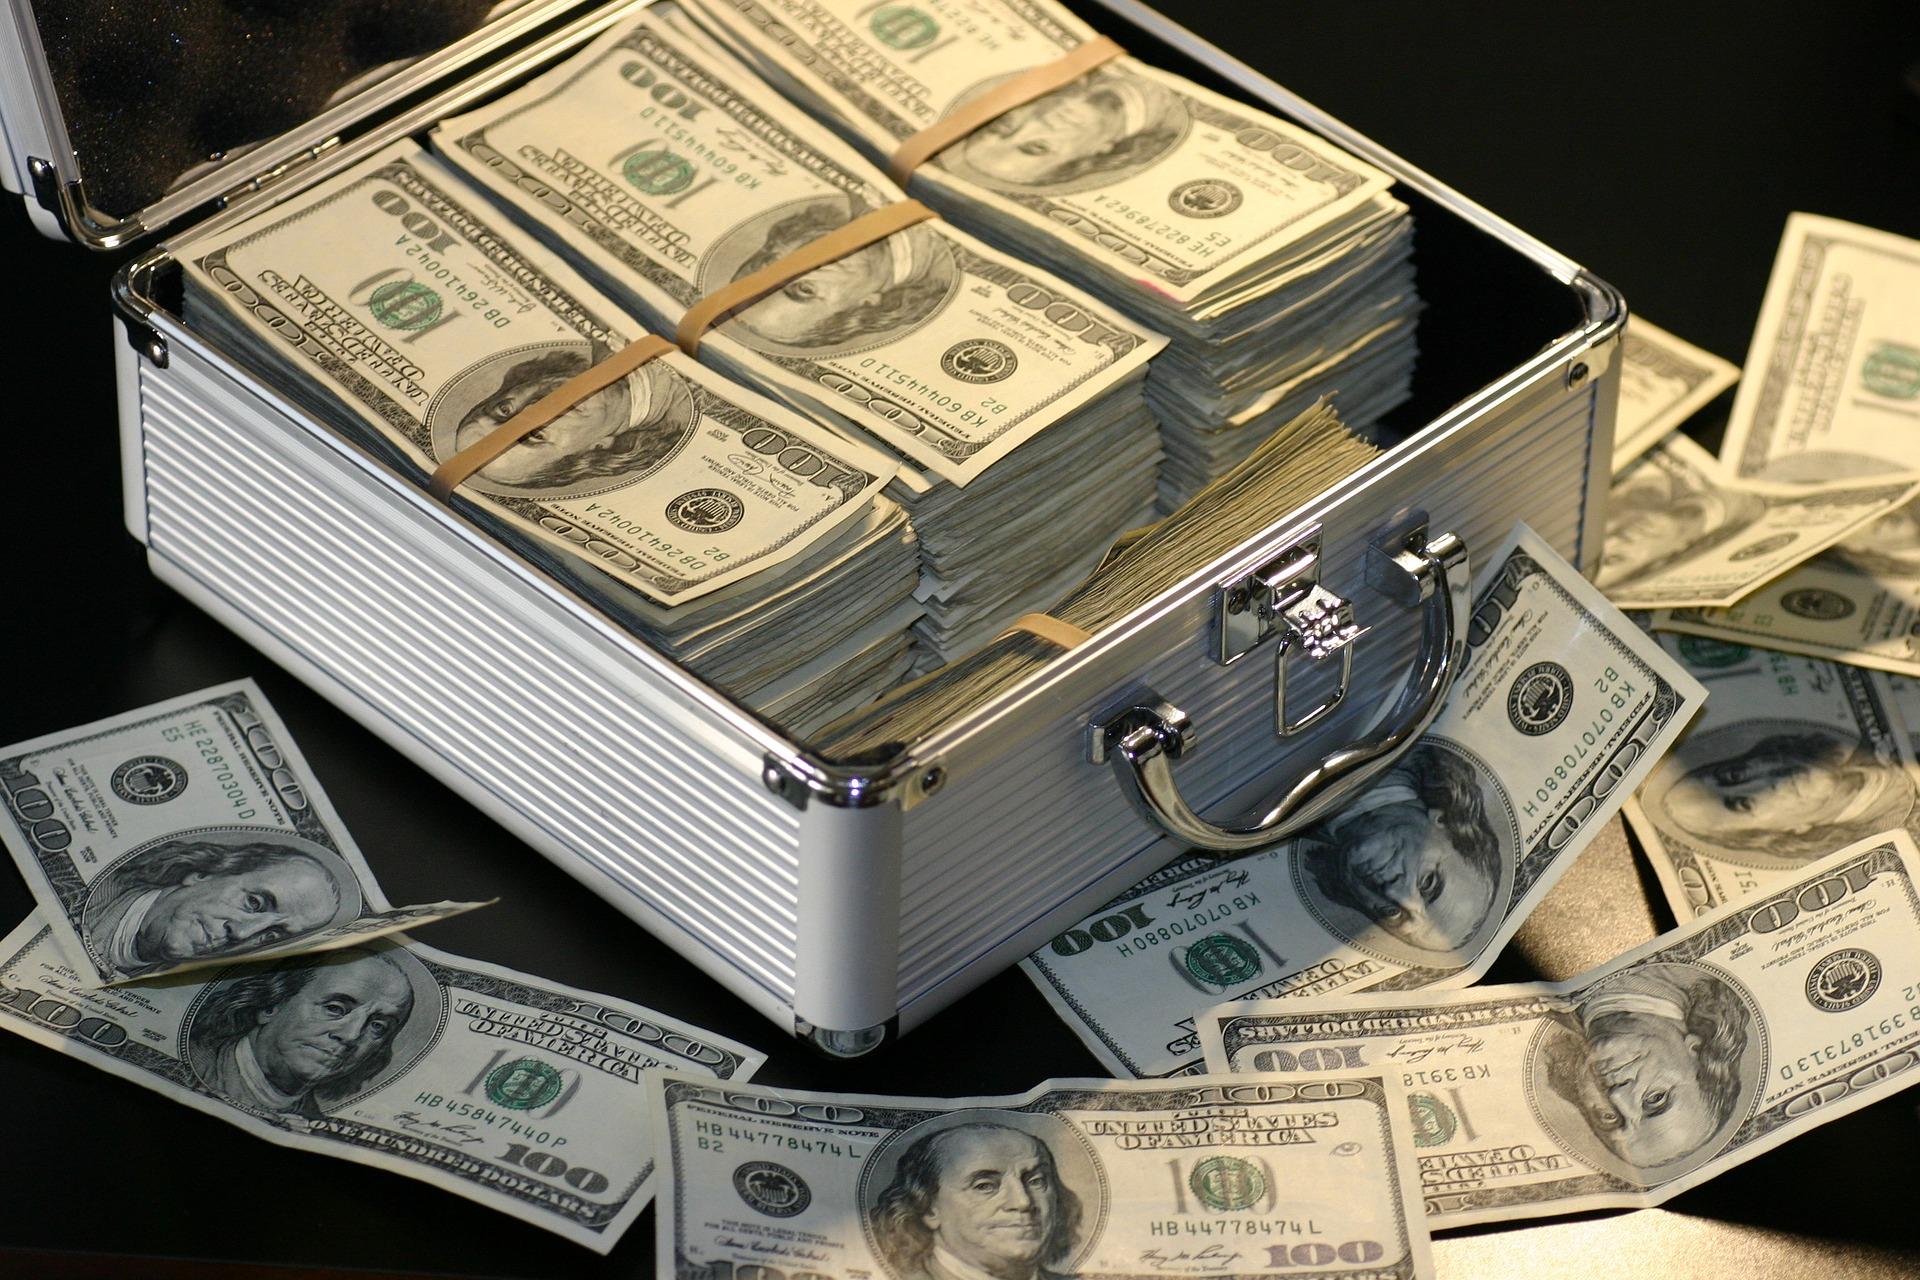 money-1428594_1920_1517585203617.jpg